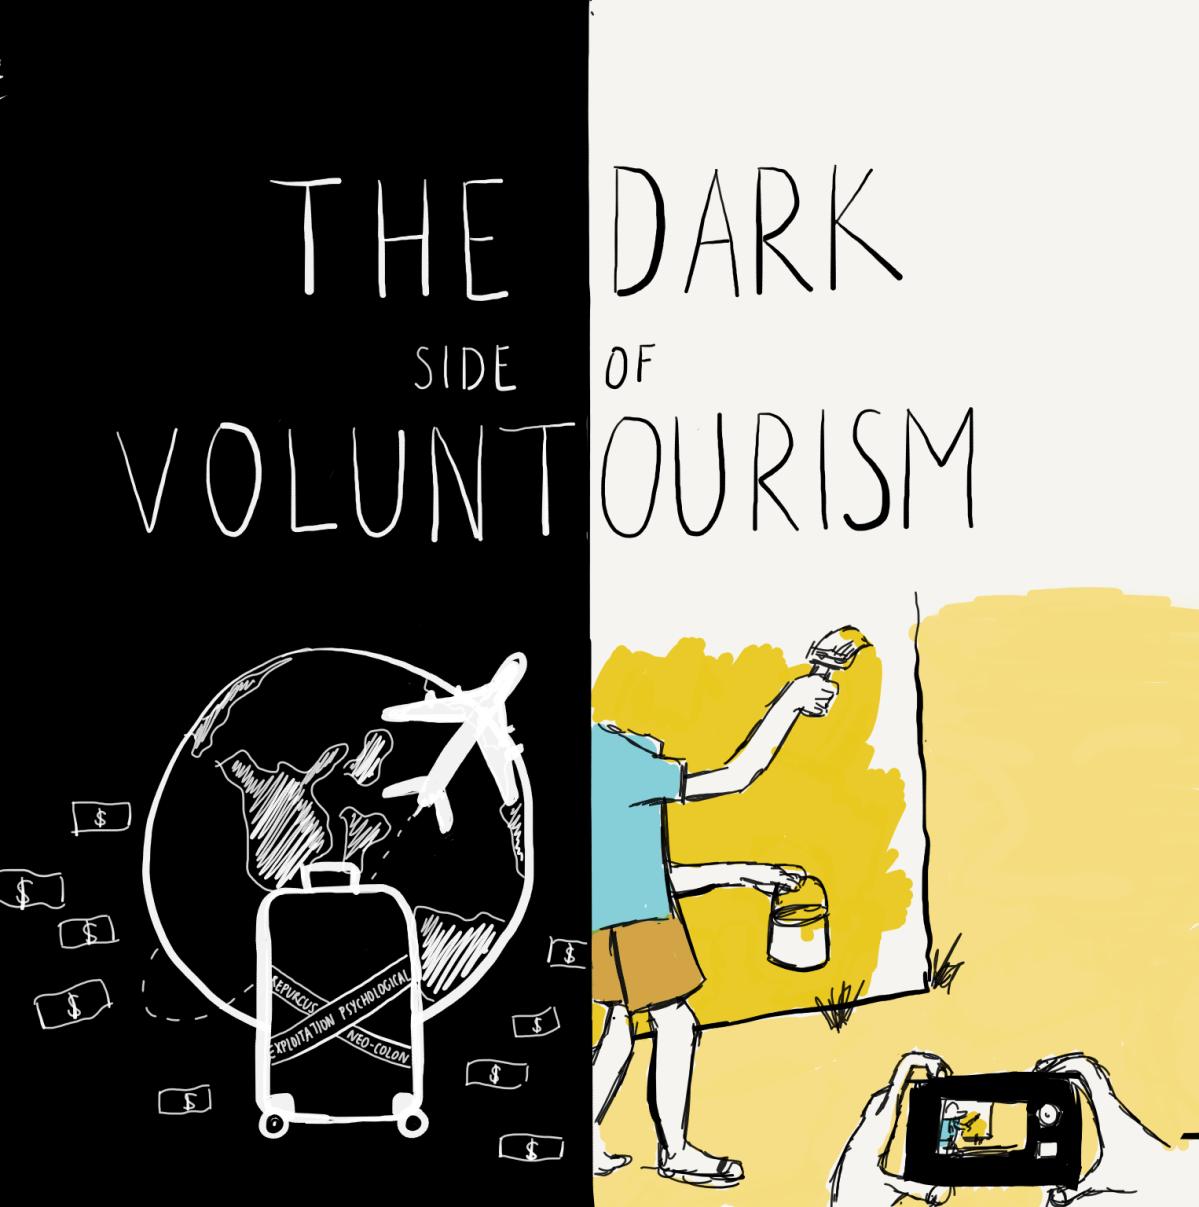 The dark side ofvoluntourism.